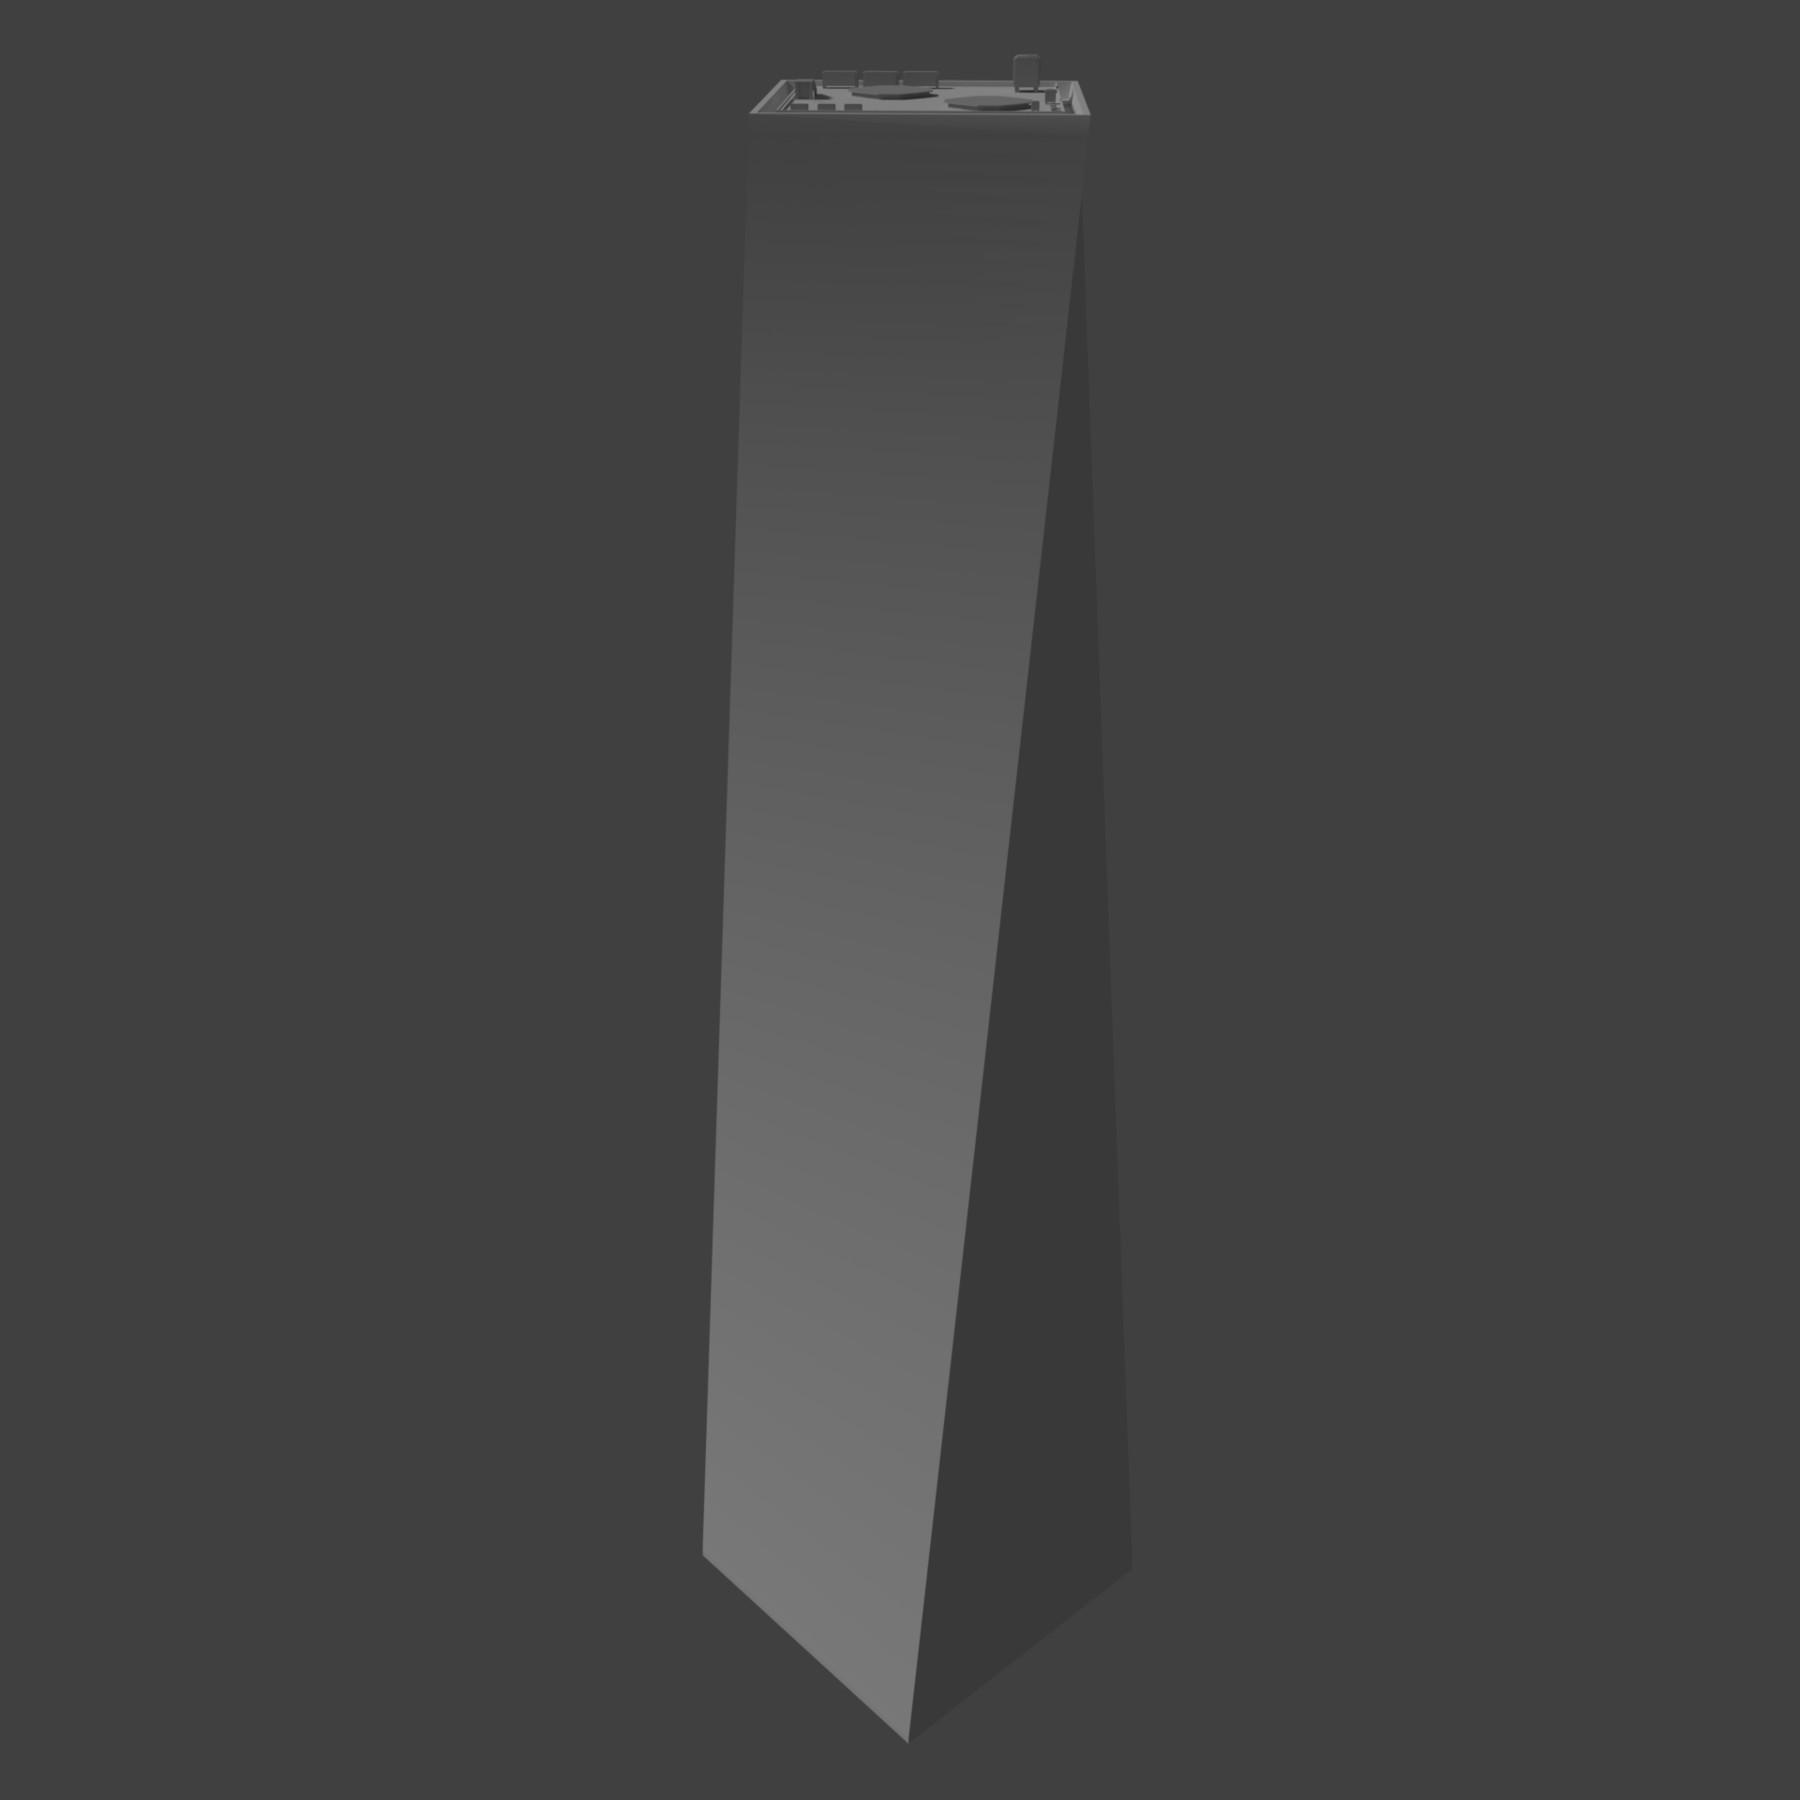 Cody Kempf - Twister Tower Skyscraper